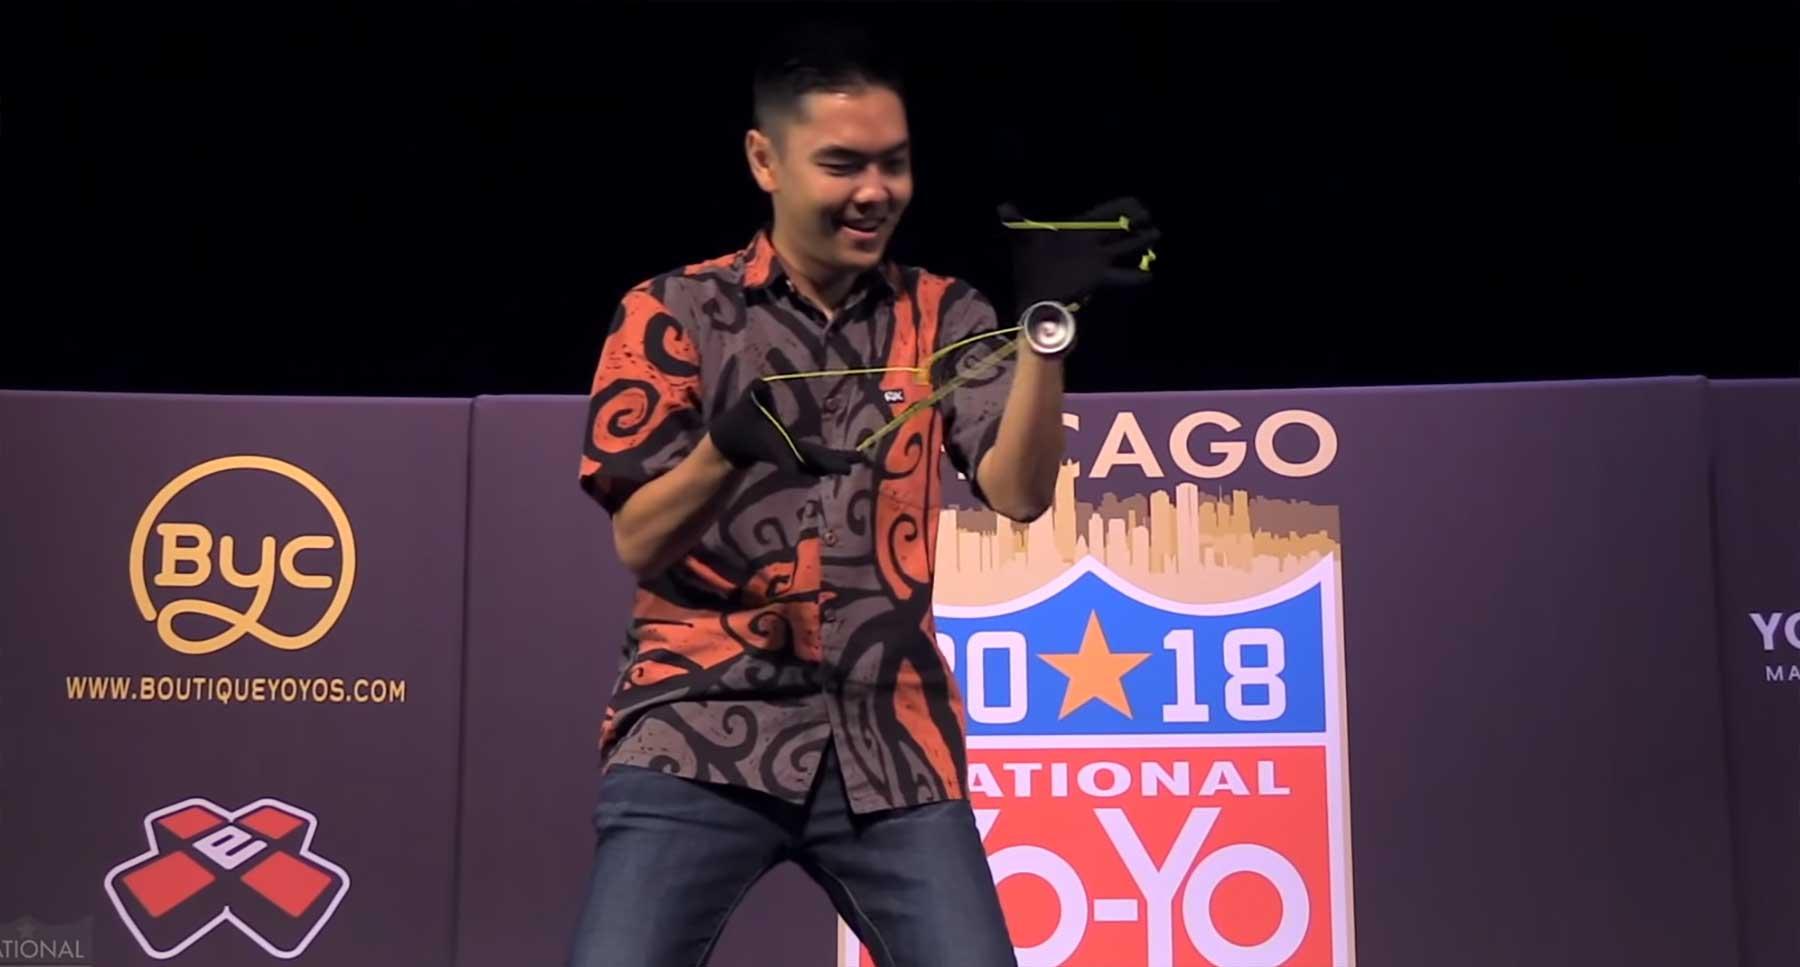 Evan Nagaos Gewinnerlauf bei den Jojo-Meisterschaften 2018 Jo-Jo-Meister-2018-Evan-Nagao